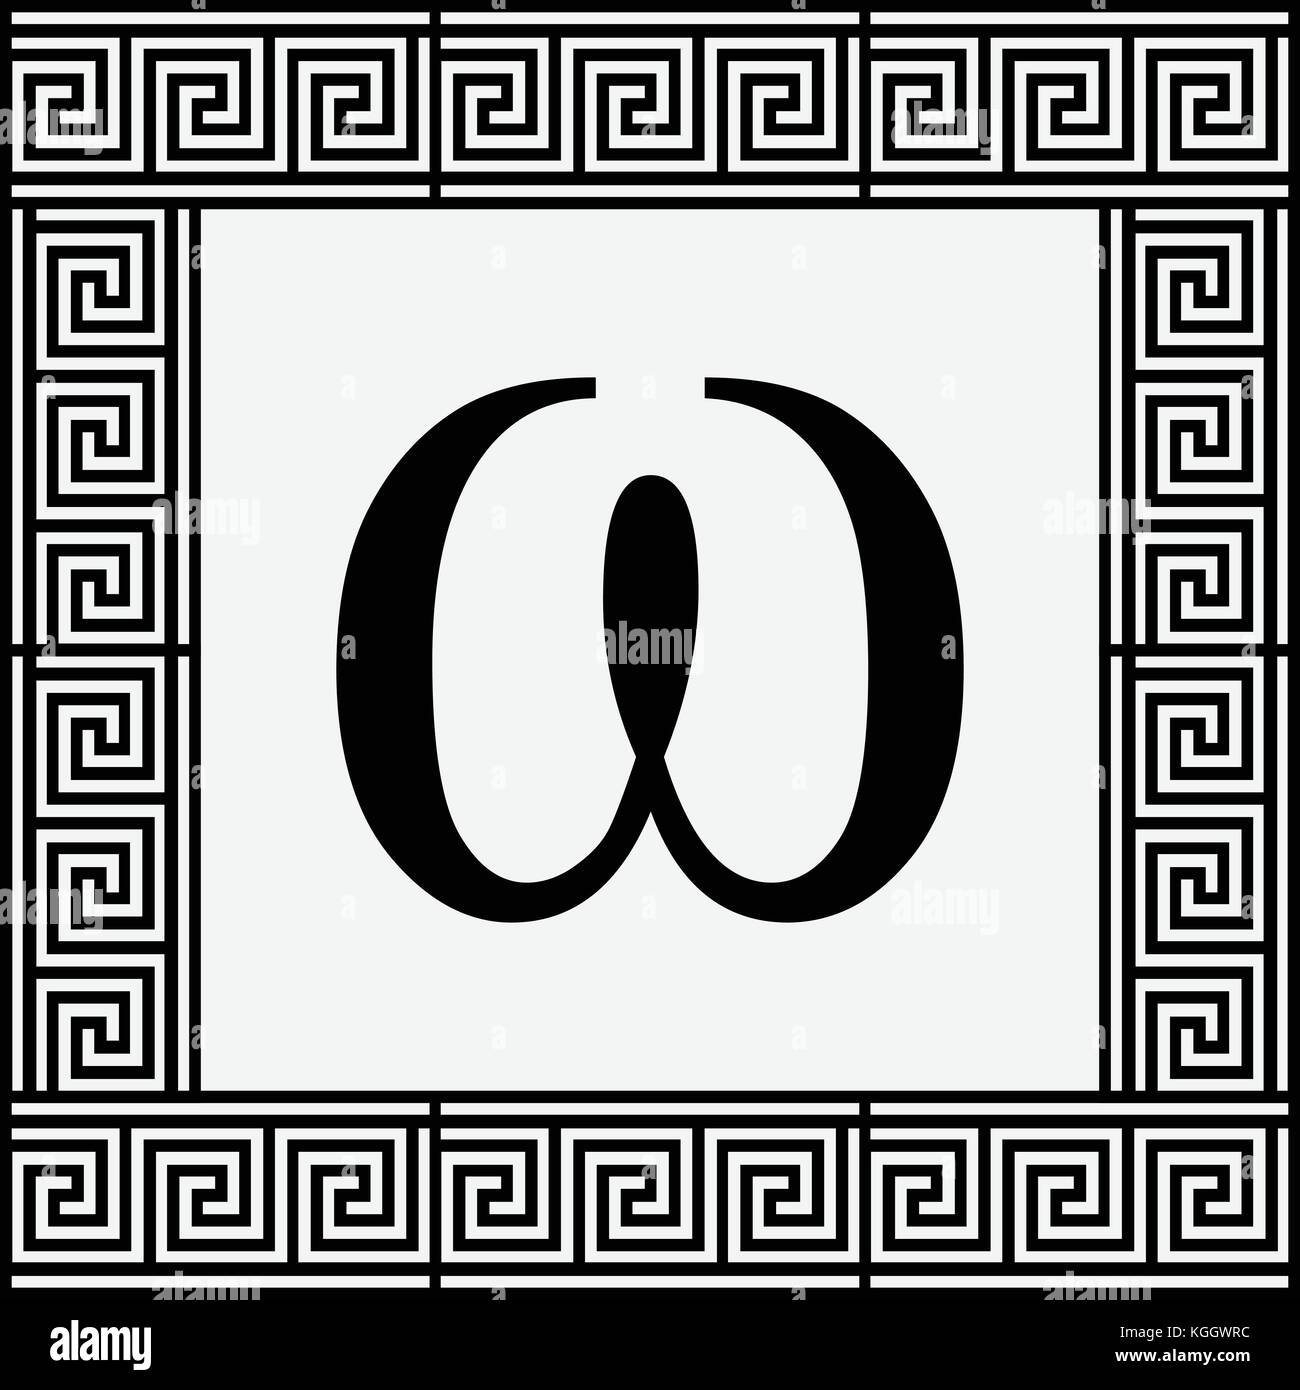 Omega greek letter icon omega symbol in ancient greek frame omega greek letter icon omega symbol in ancient greek frame vector illustration biocorpaavc Gallery